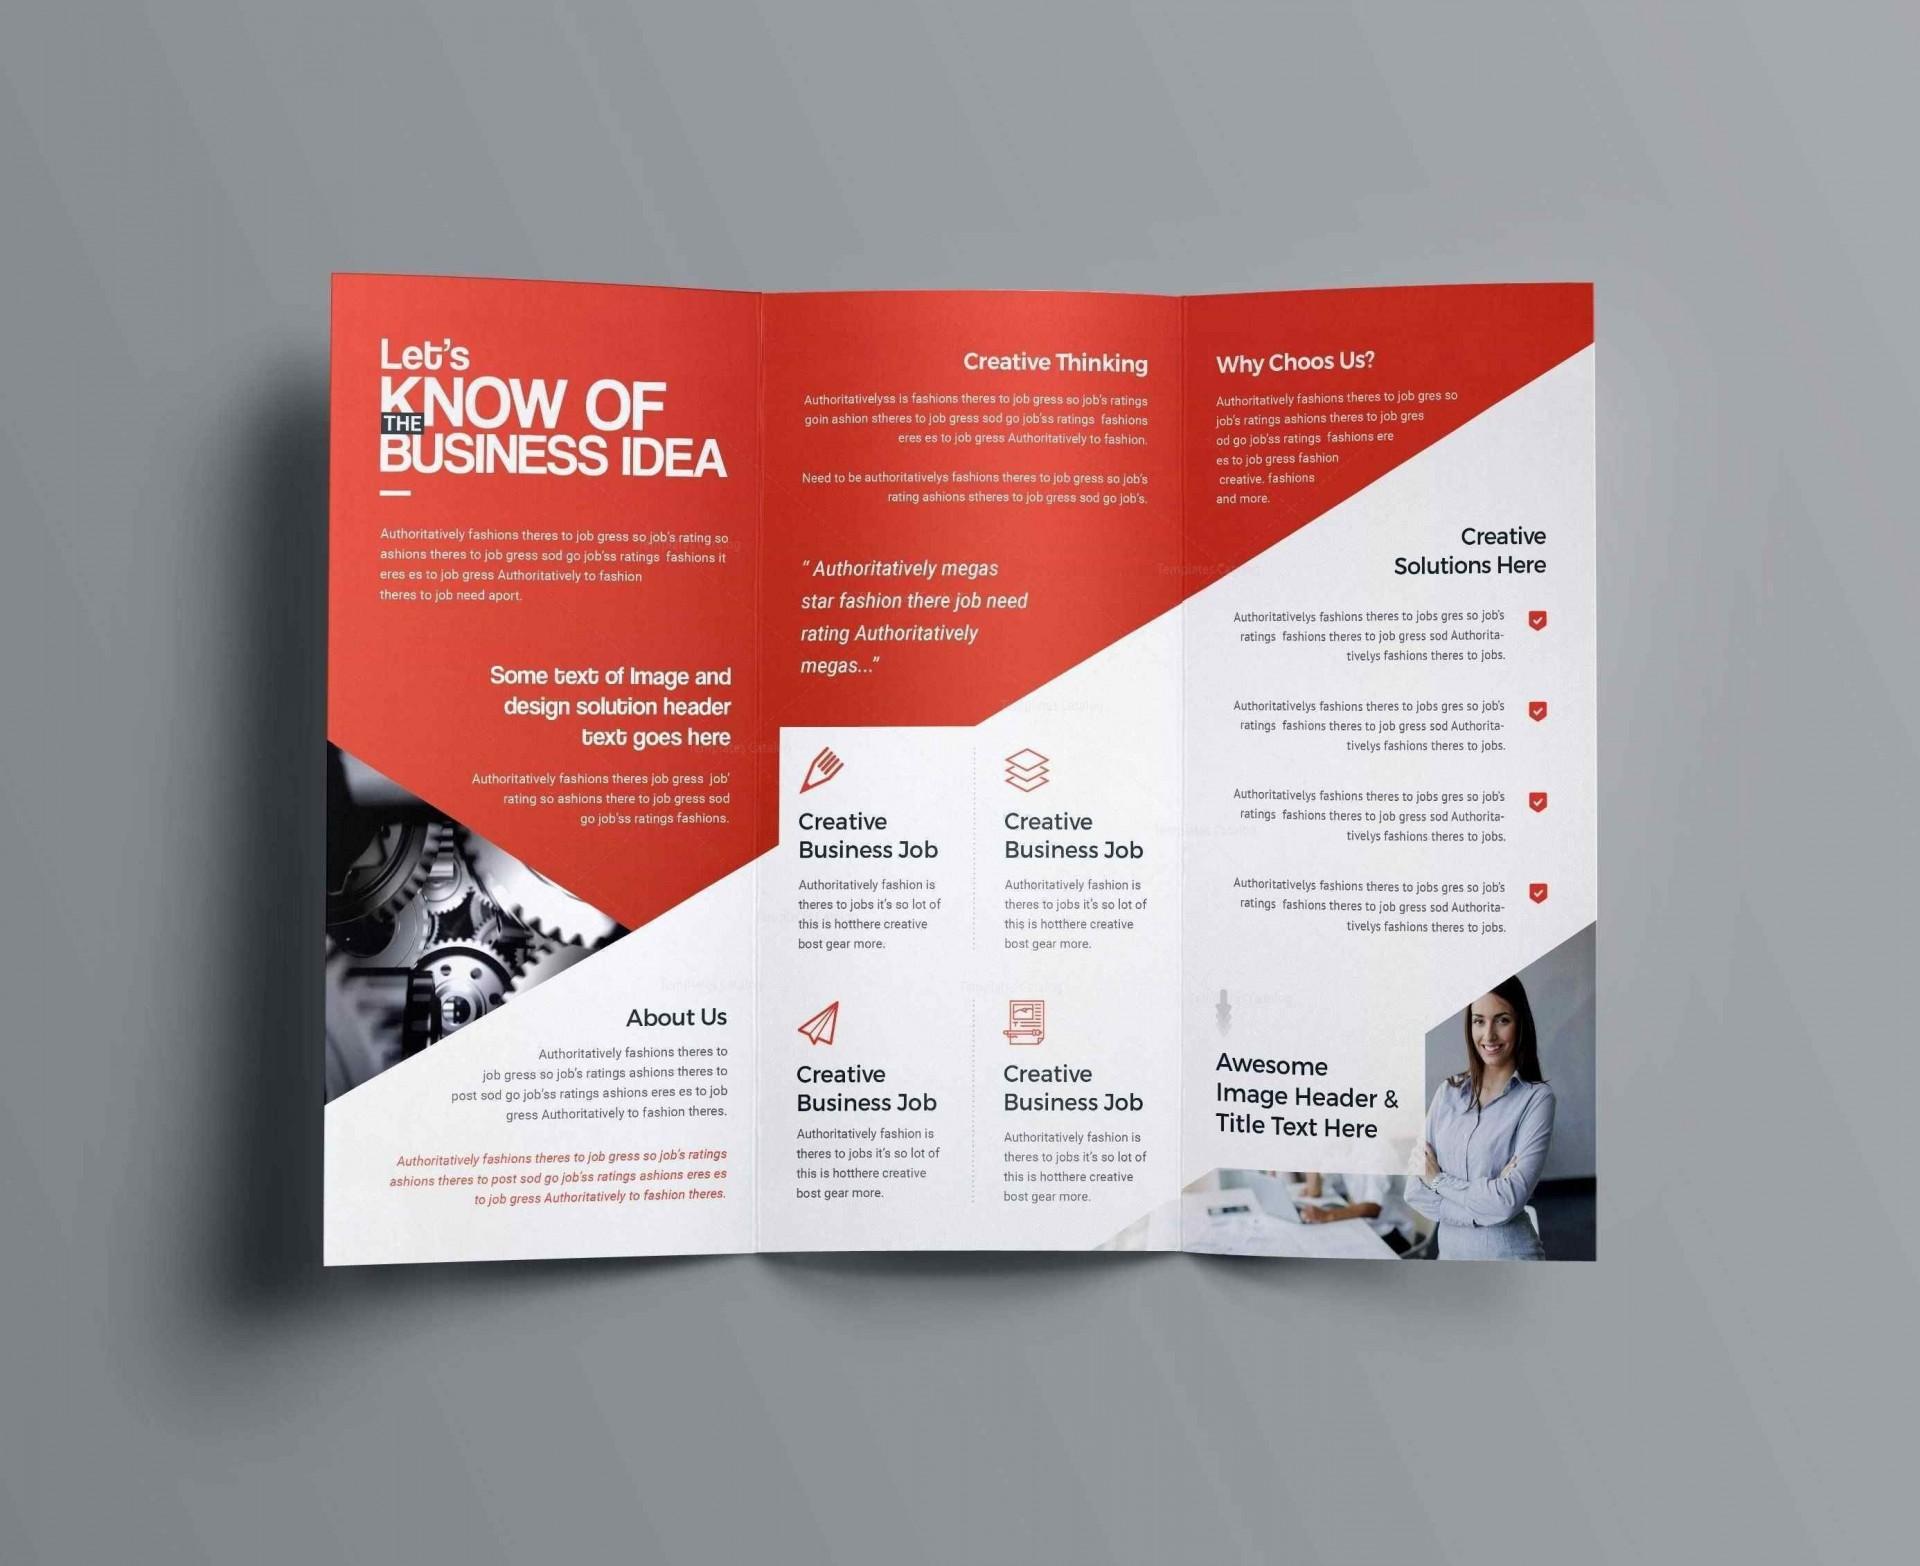 002 Surprising Busines Flyer Template Free Download High Resolution  Psd Design1920